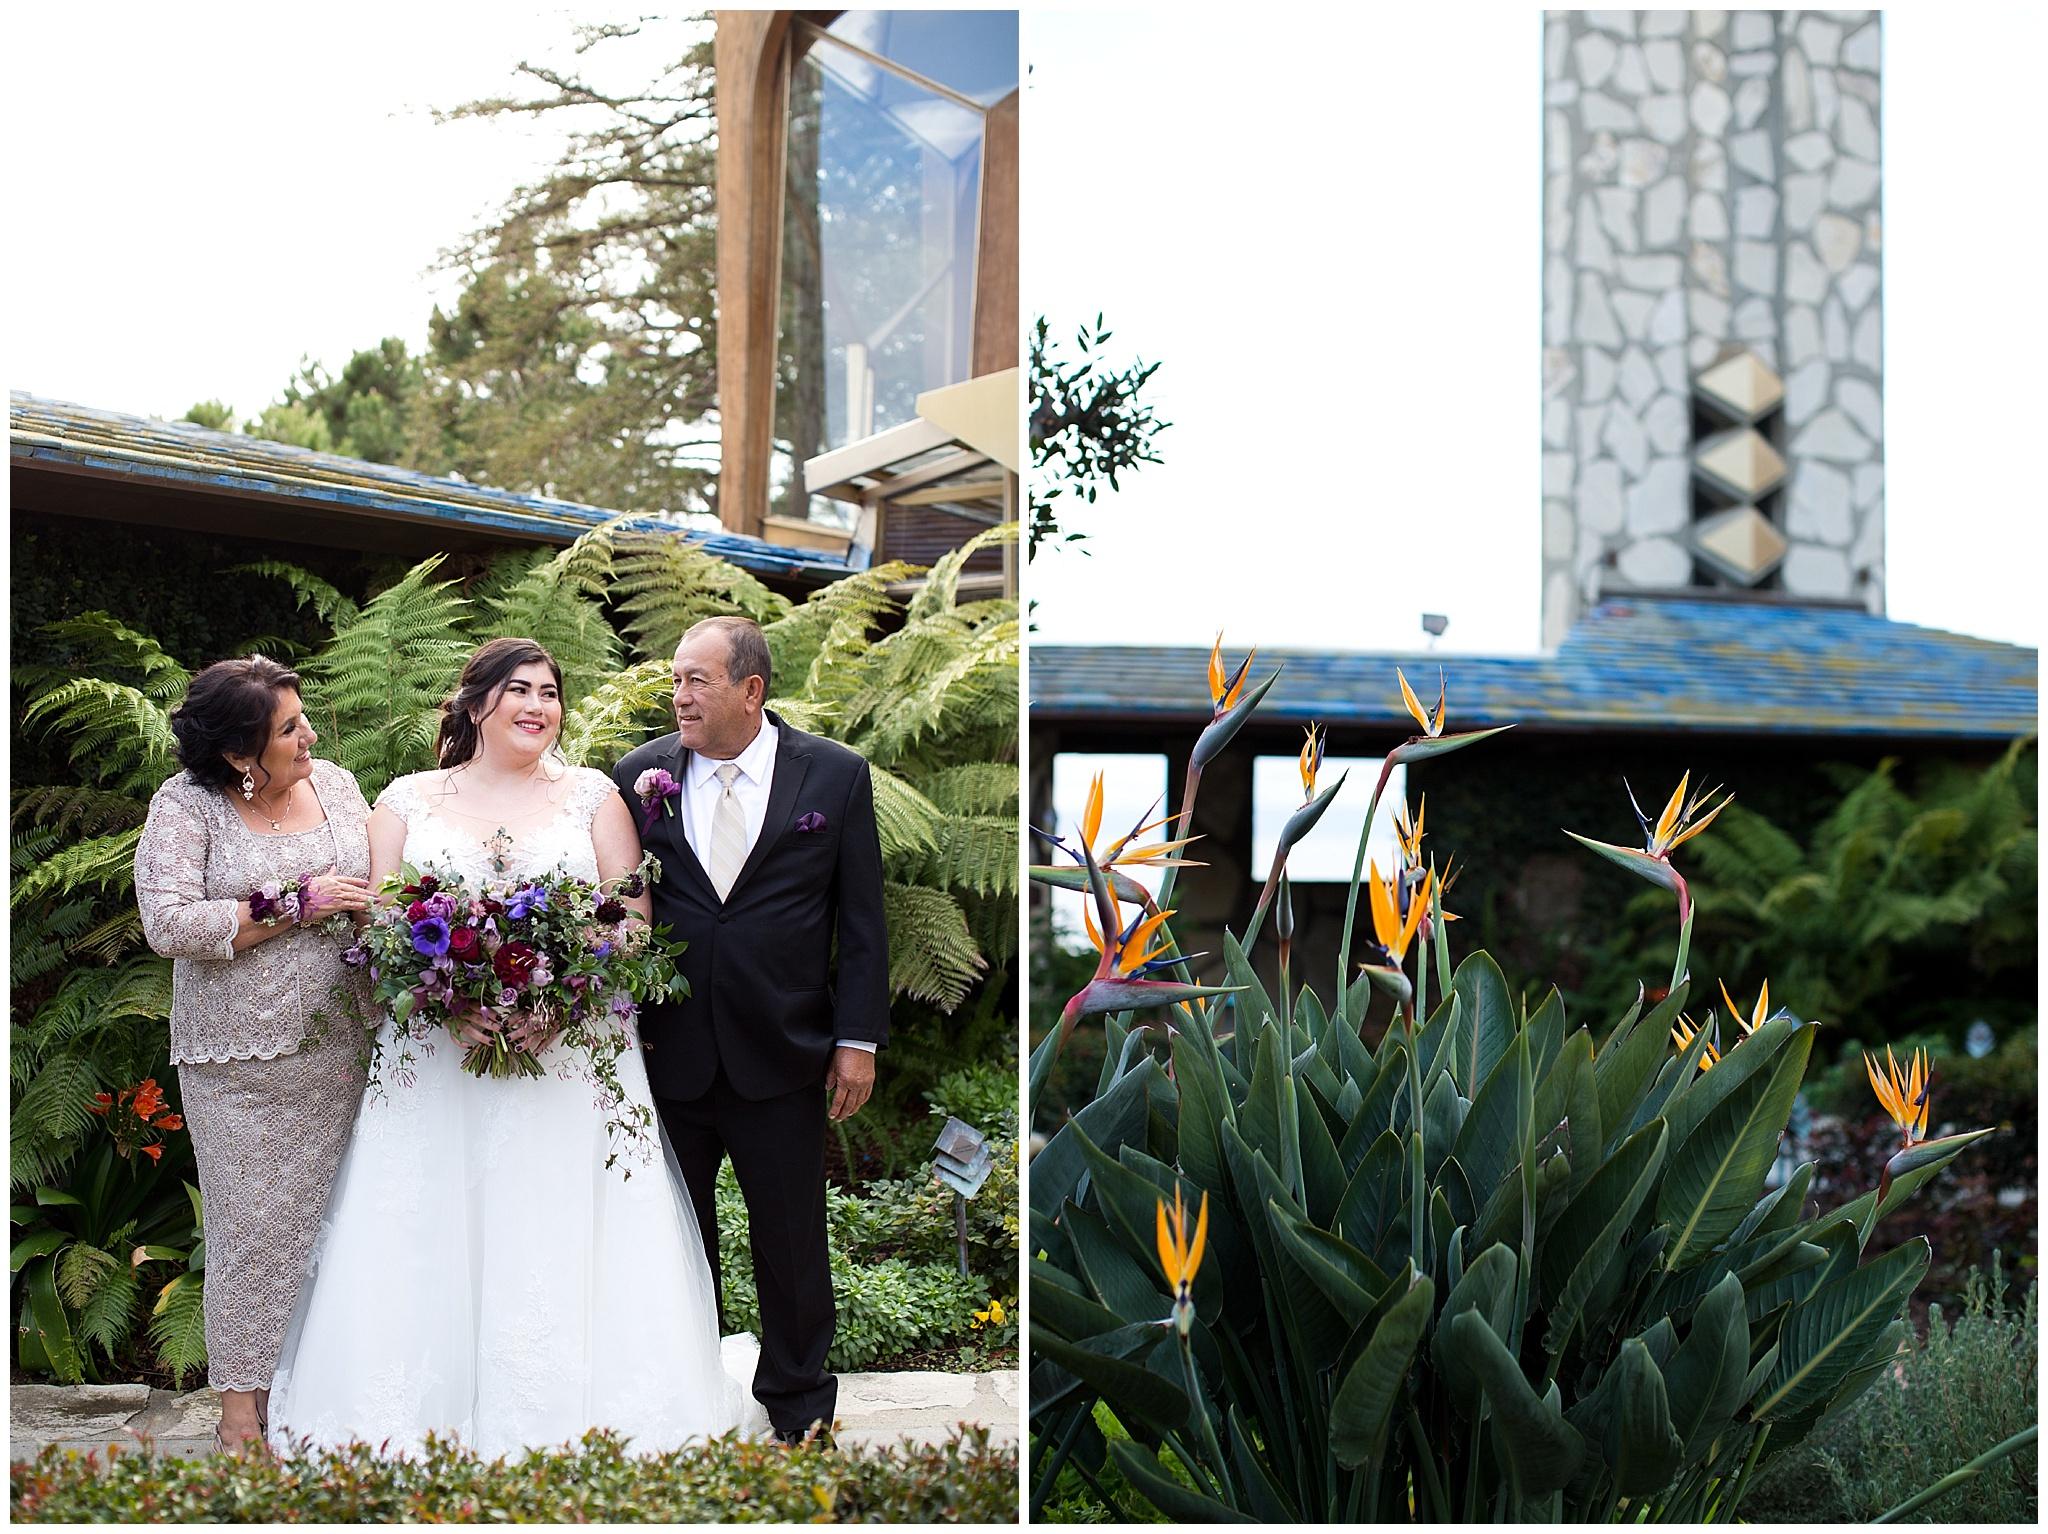 Carol_and_Grant_Wedding_3-3-18-7725.jpg